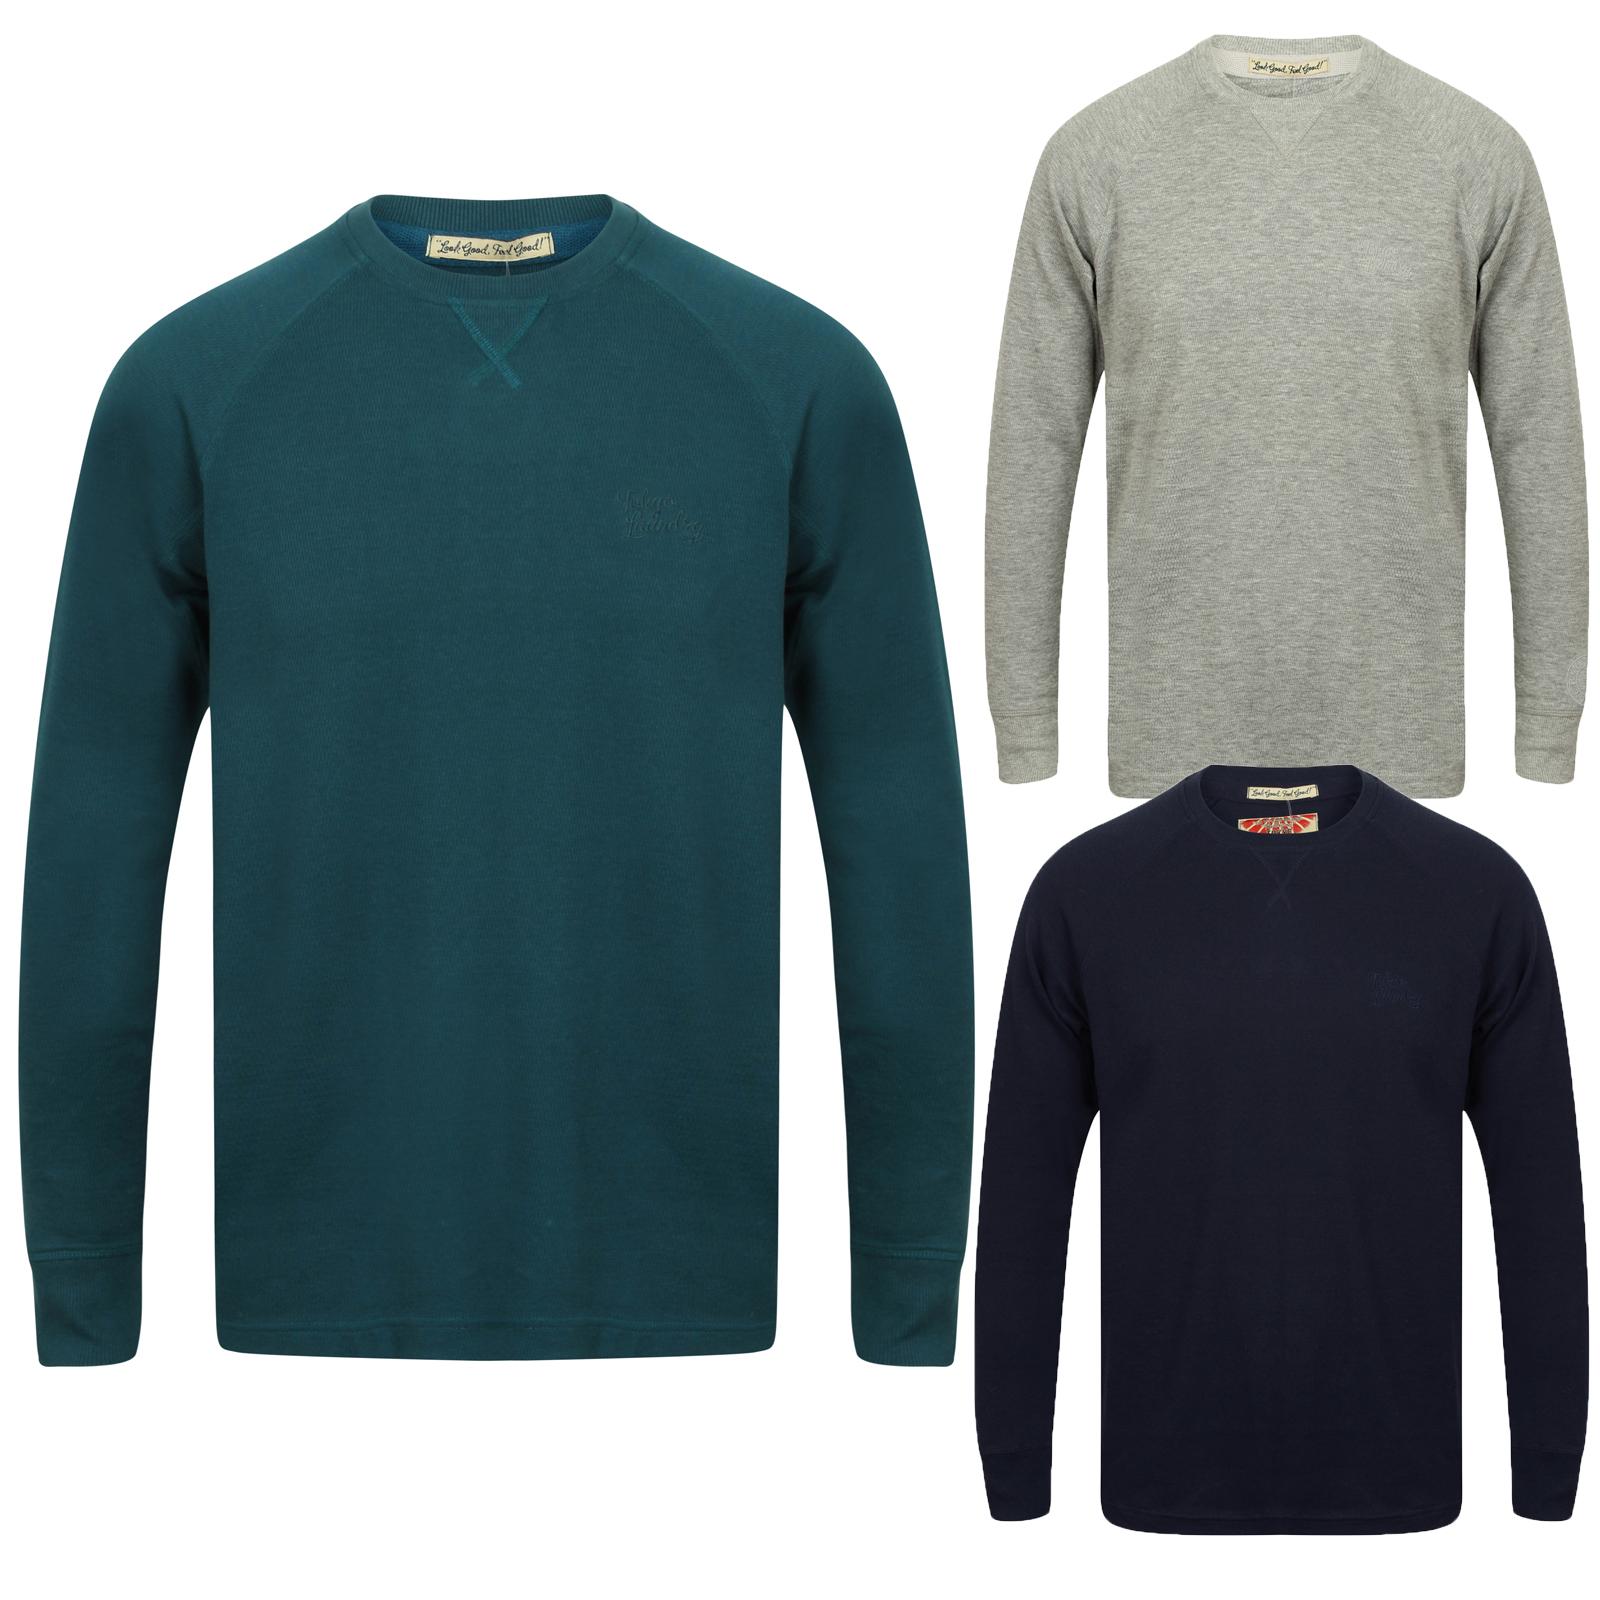 Tokyo Laundry Mens Designer T Shirt Long Raglan Sleeve Casual Top